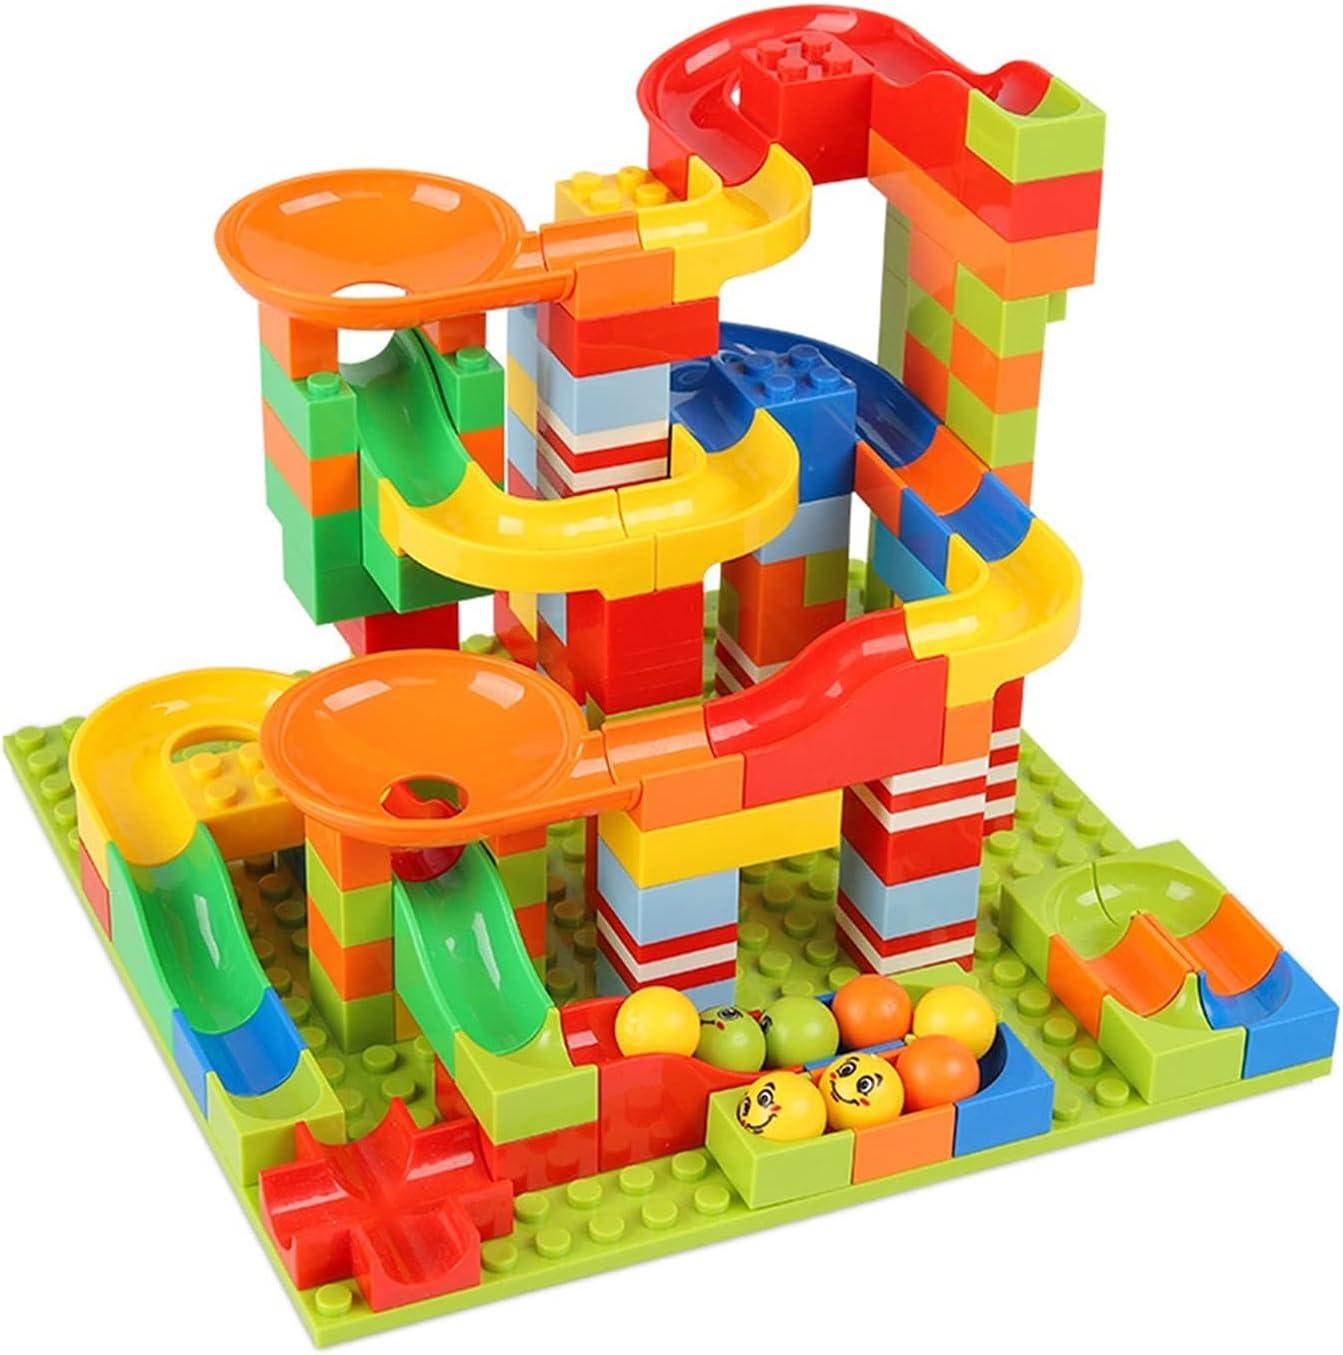 HEMOTONE 330pcs Marble Finally resale start Race Run Maze Building Blocks Factory outlet Ball Track